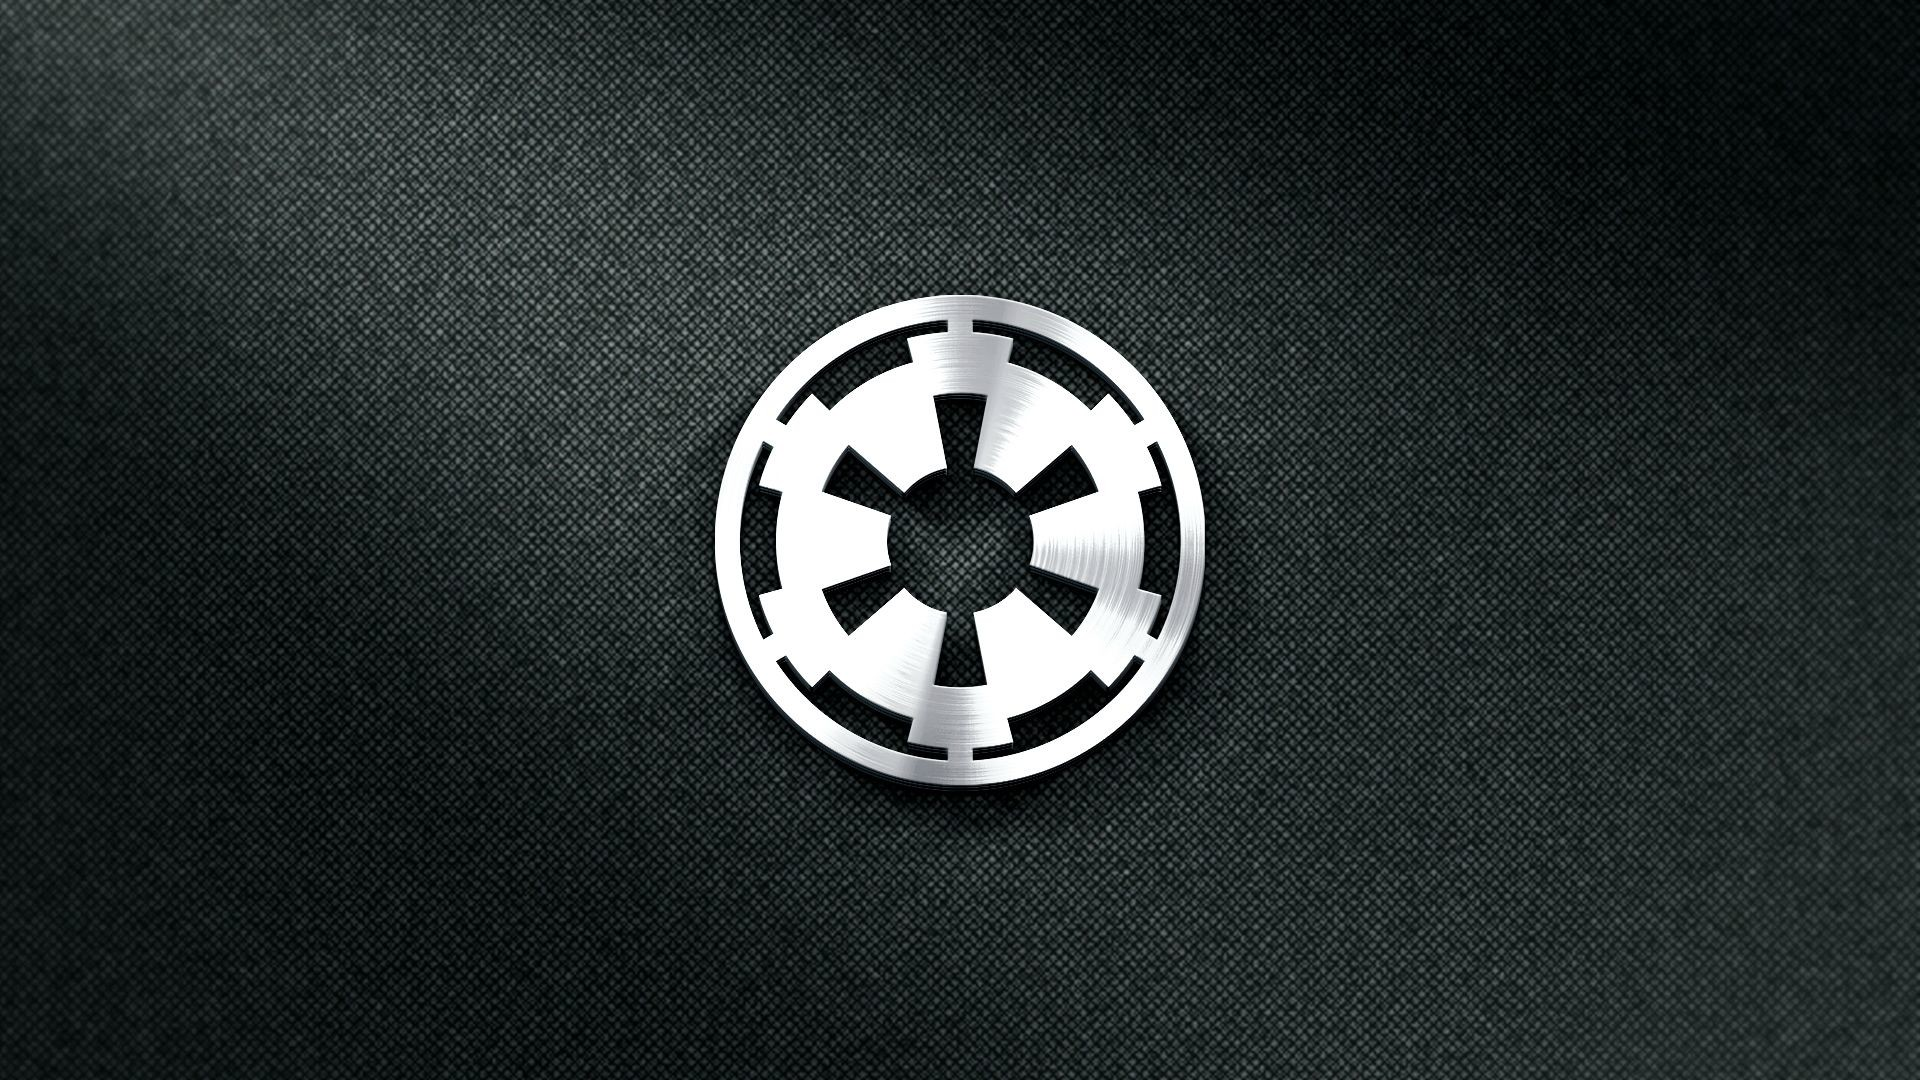 Res: 1920x1080, Star Wars Empire Wallpaper High Definition For Desktop Wallpaper 1920 x  1080 px 623.08 KB lightsaber